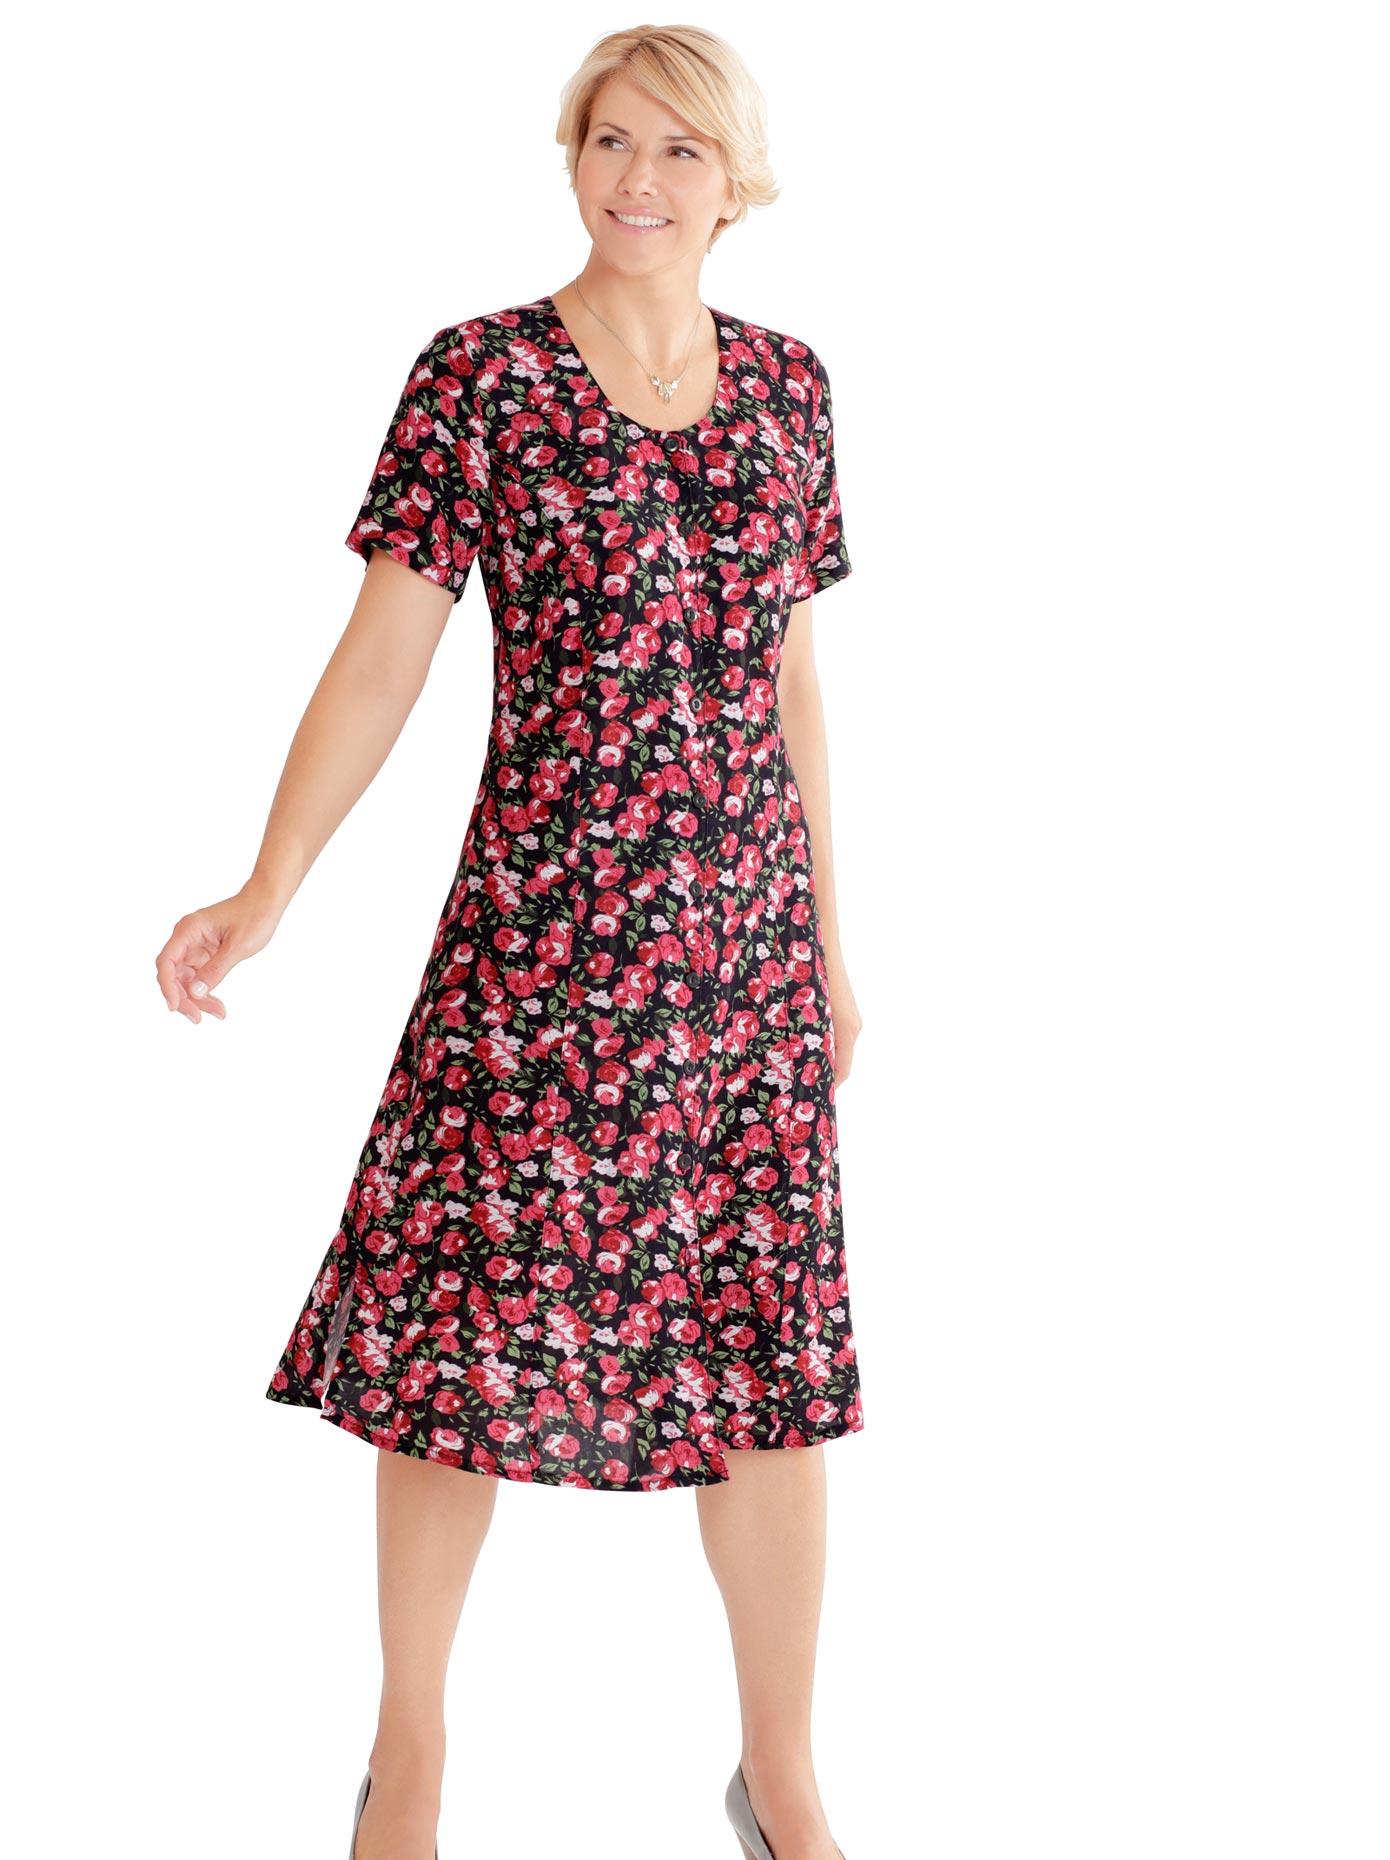 Classic Basics Kleid mit sommerlichem Blütendessin